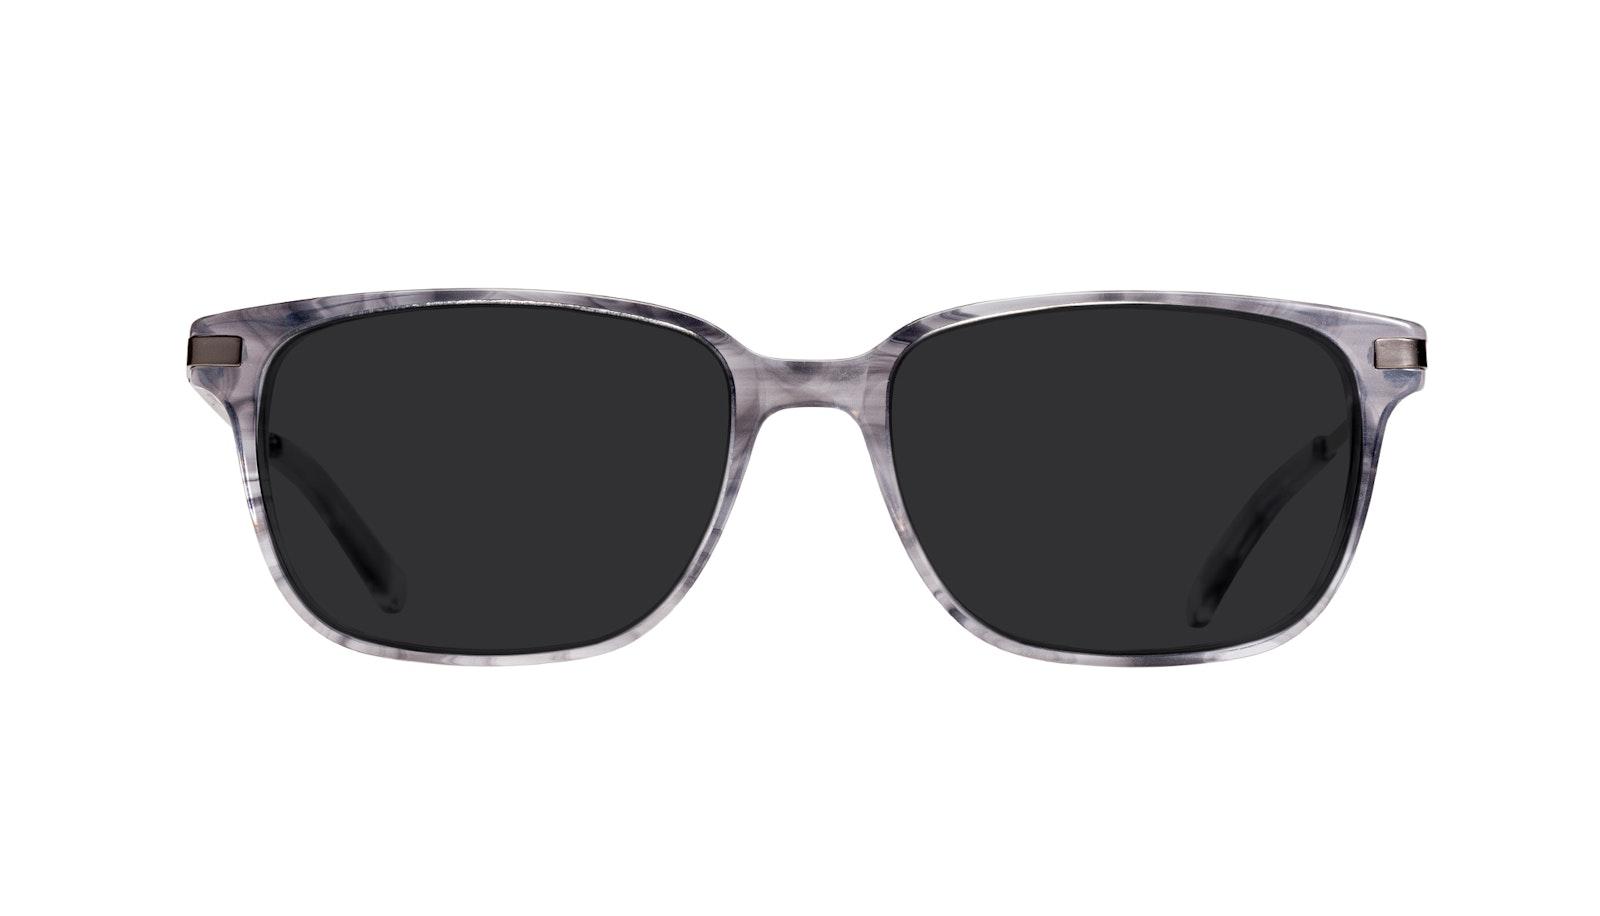 Affordable Fashion Glasses Rectangle Sunglasses Men Trade Smokey Grey